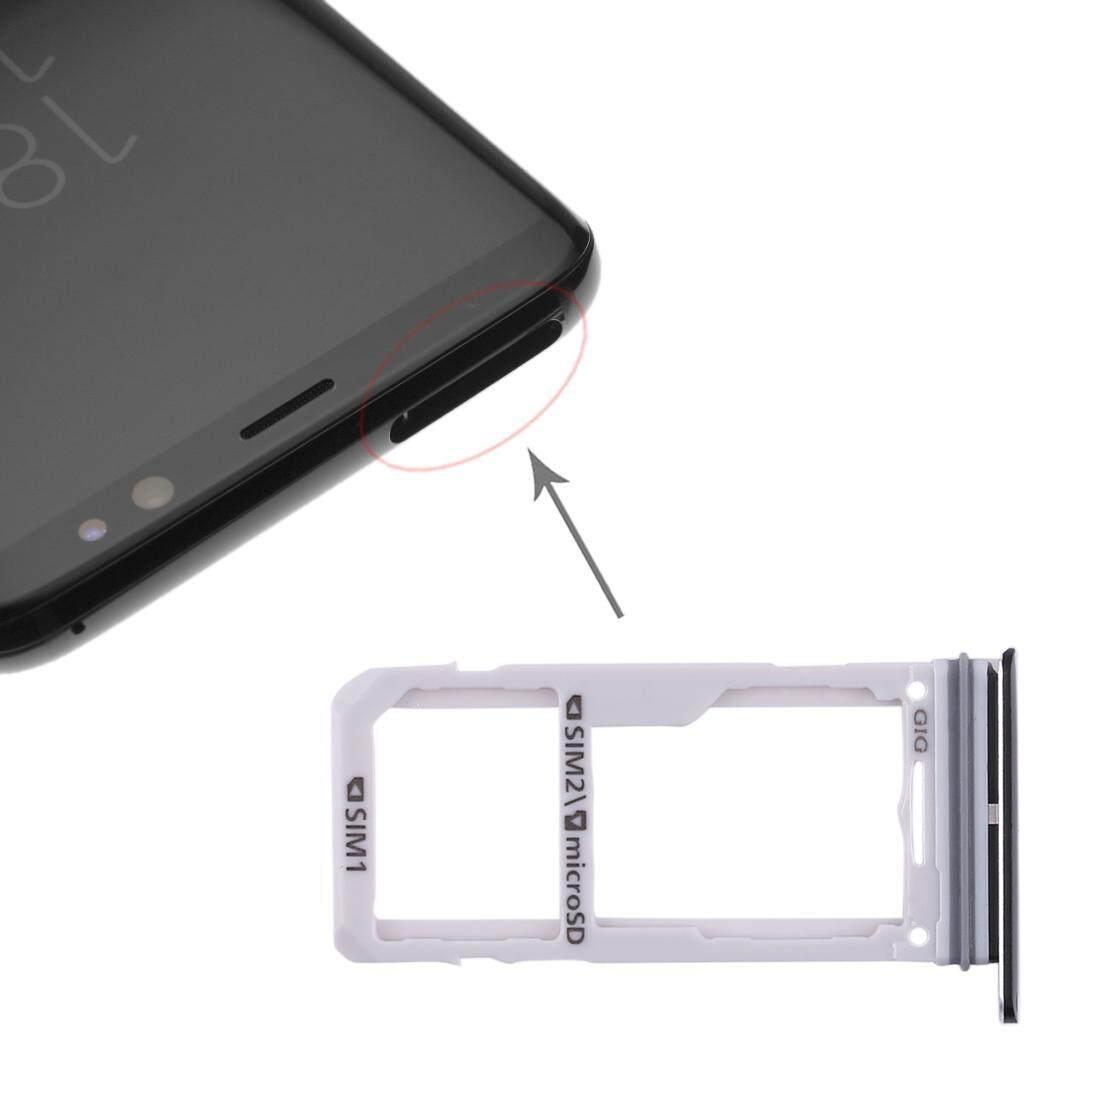 Samsung Galaxy S8 Sd Karte.2 Sim Card Tray Micro Sd Card Tray For Galaxy S8 S8 Black